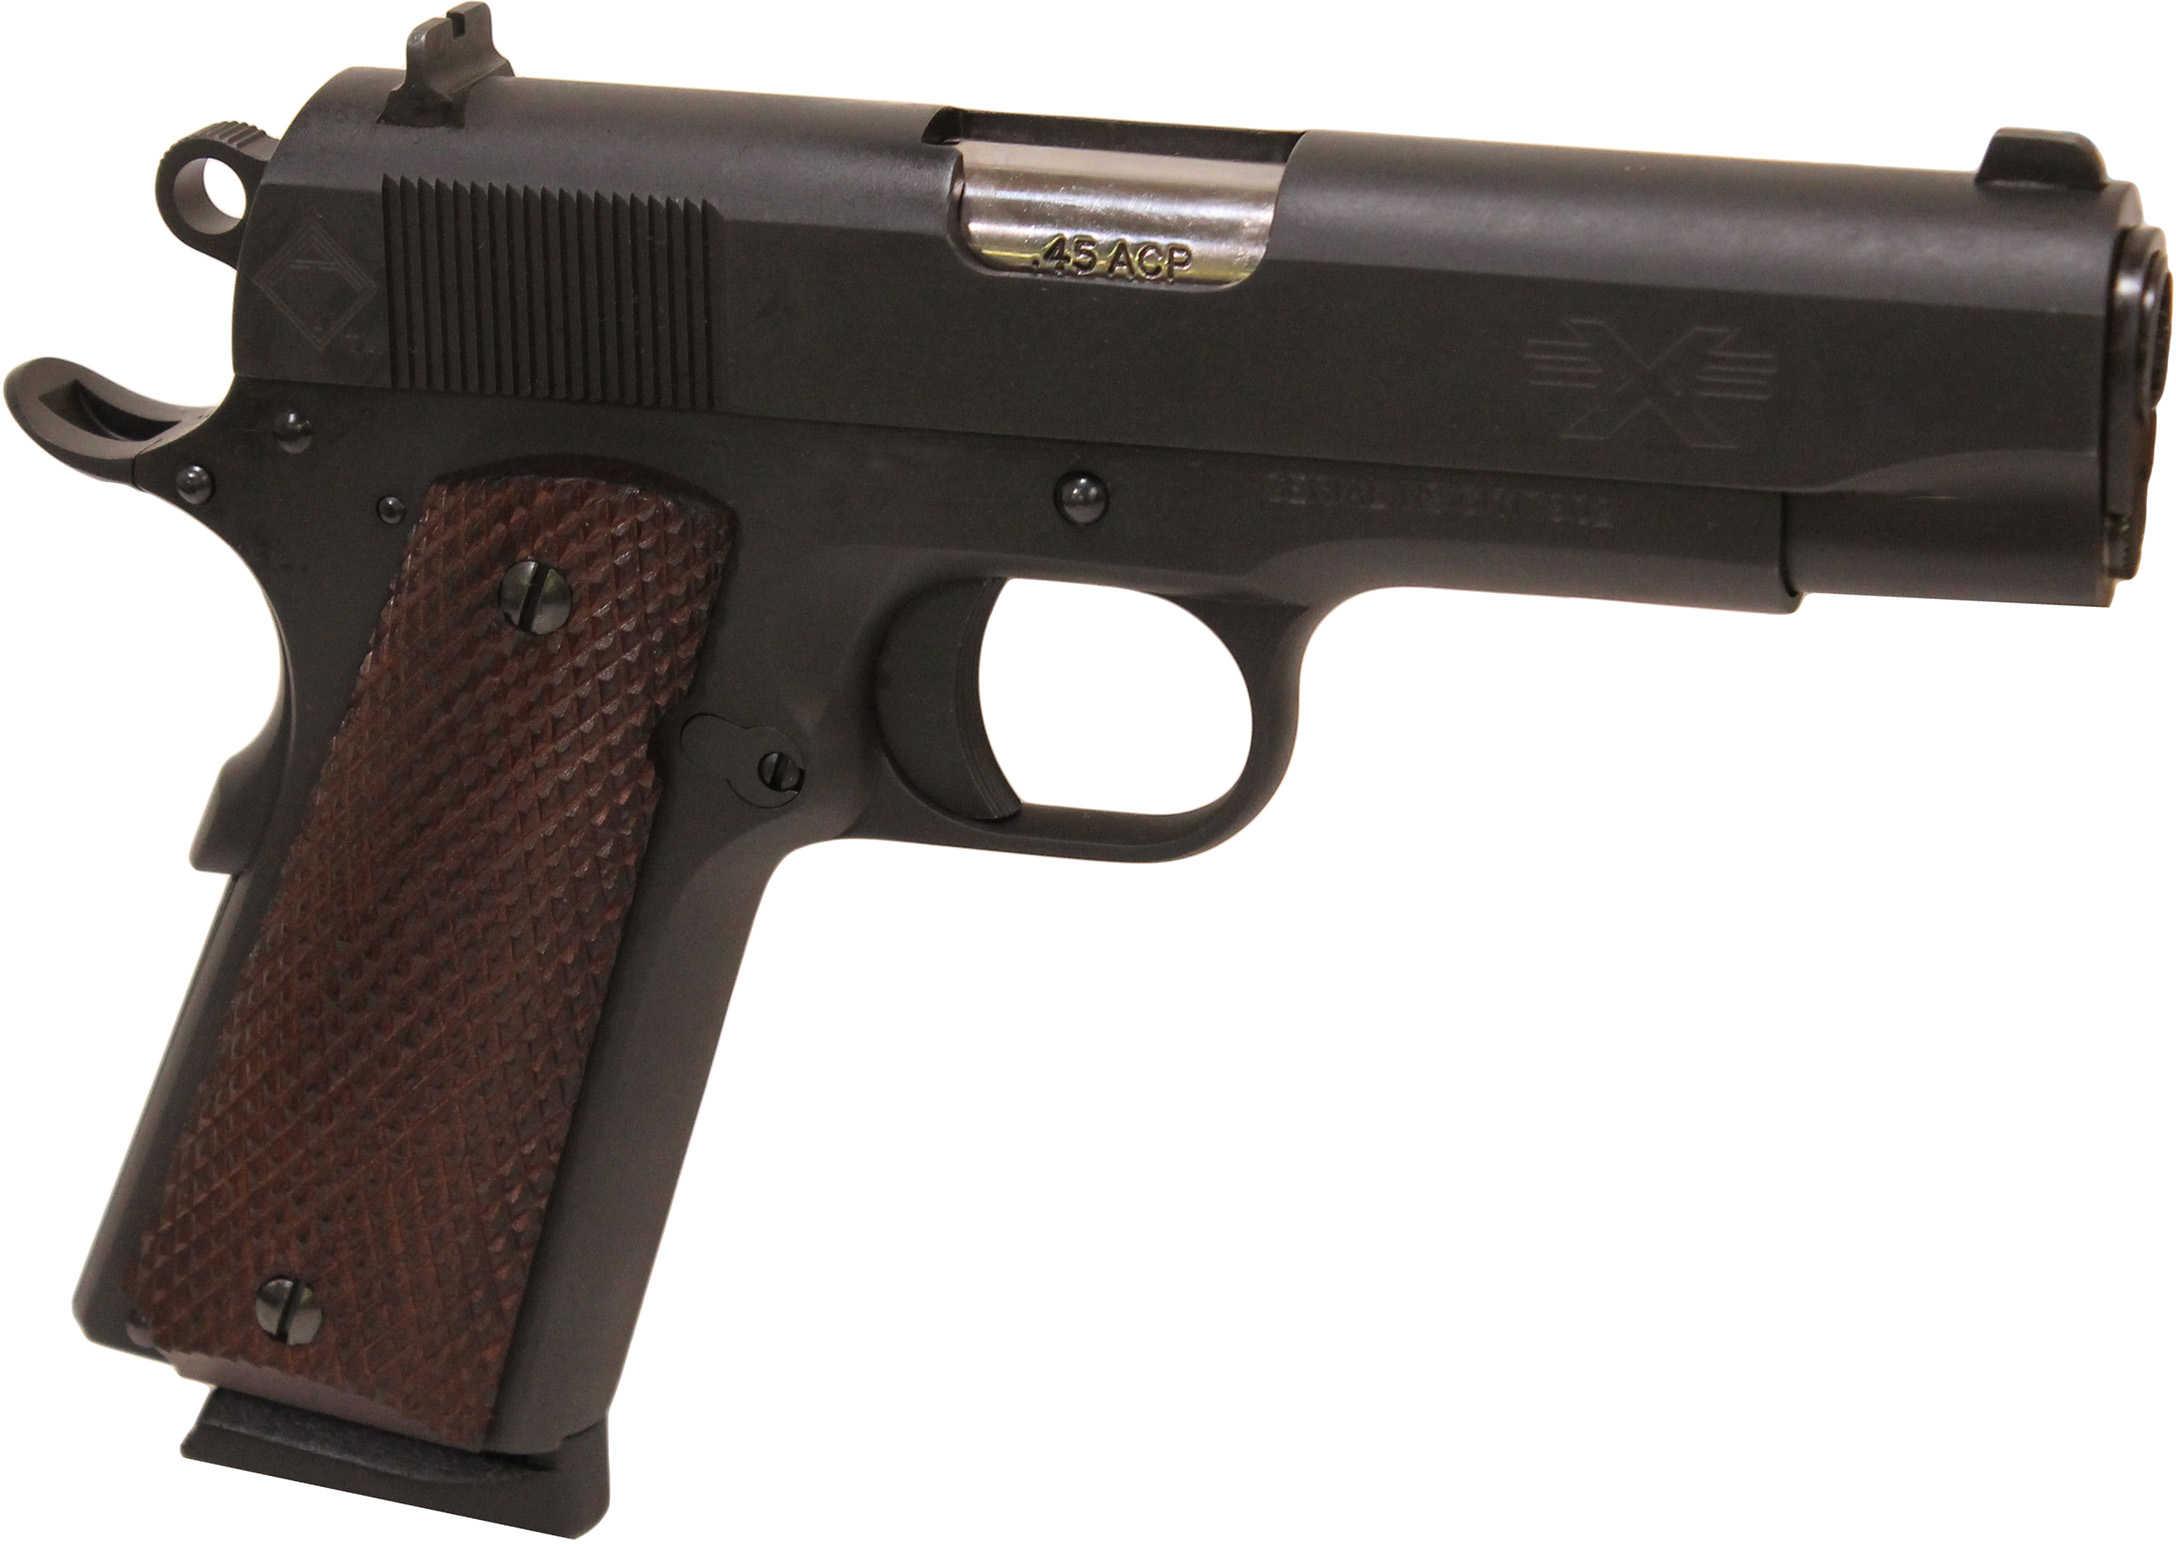 "American Tactical Imports FX45 1911 G1 45 ACP 4.25"" Barrel 8 Round Blued Steel Semi Automatic Pistol GFX45GI"